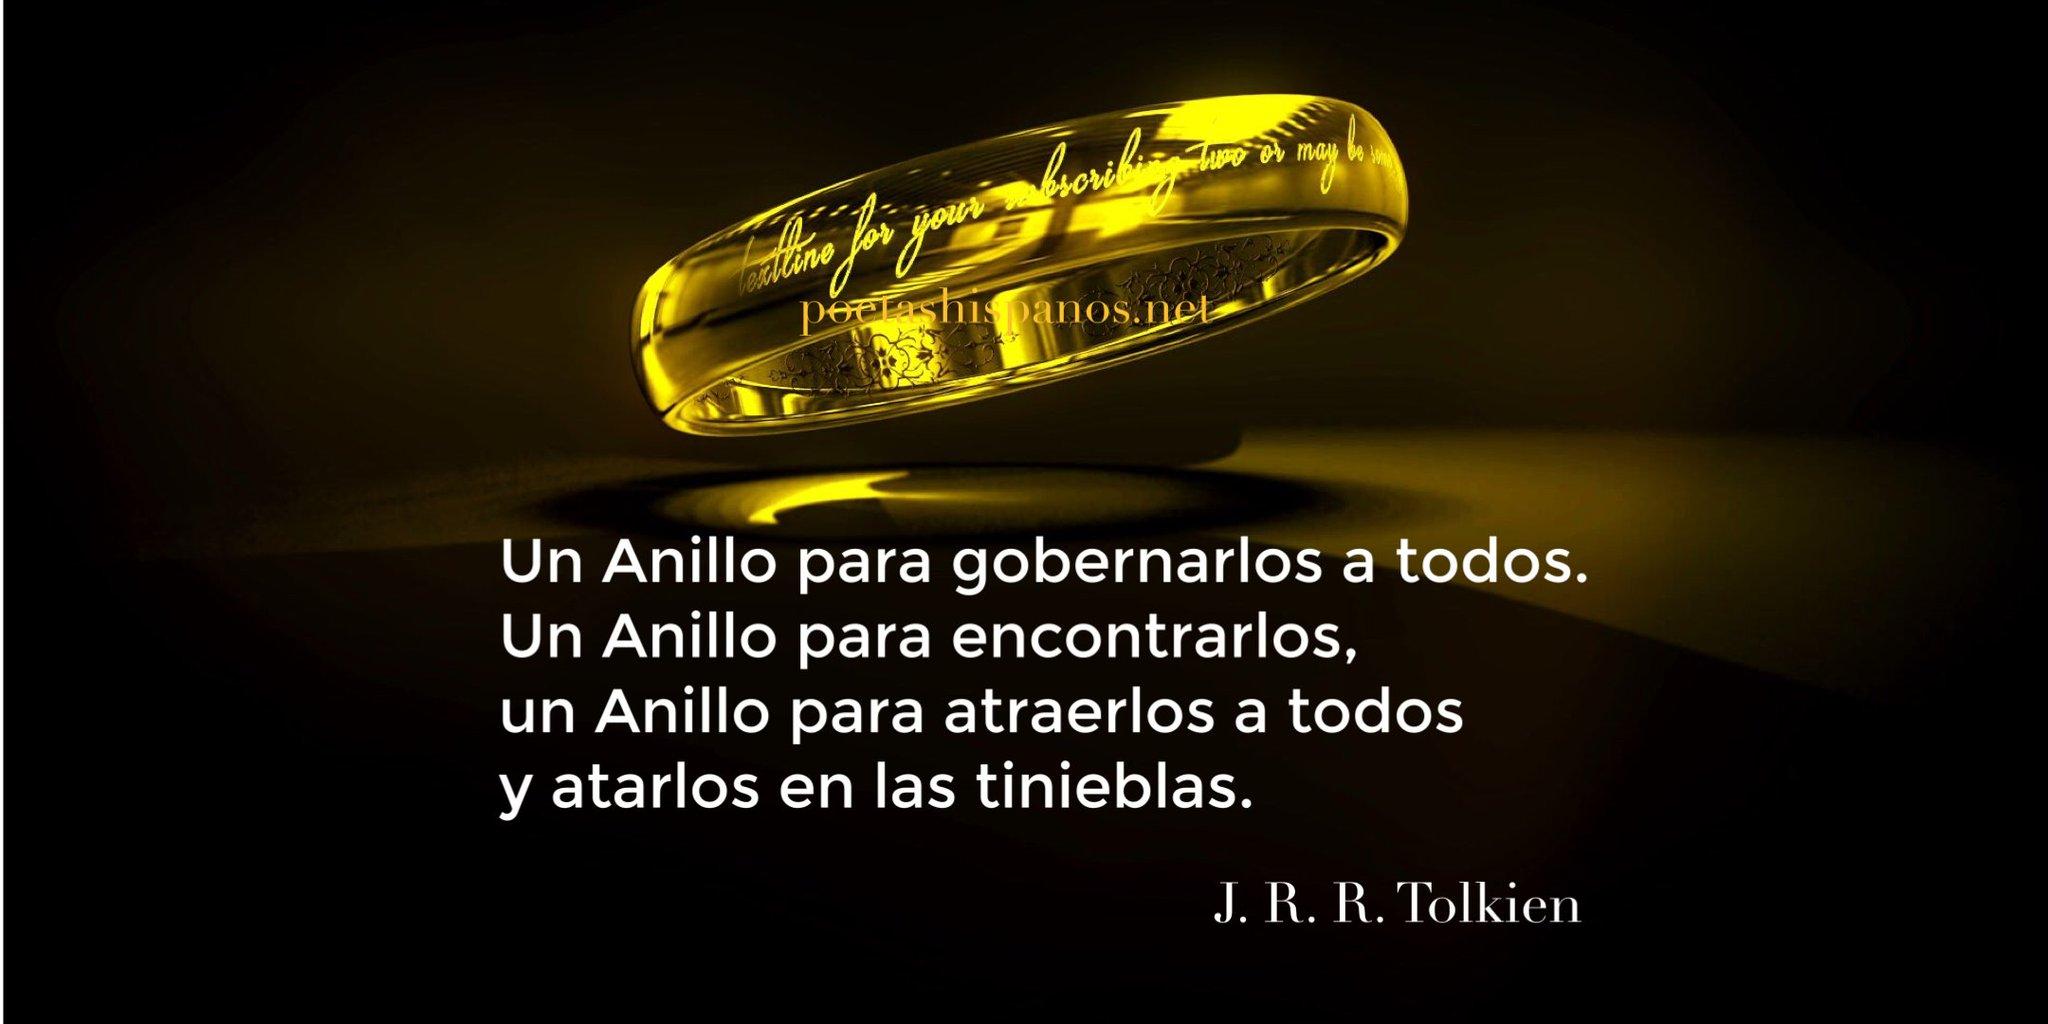 "Poetas Hispanos® on Twitter: ""Poemas y canciones del Señor de los Anillos... https://t.co/RzAQl1jXKk #PoetasHispanosMagazine… """